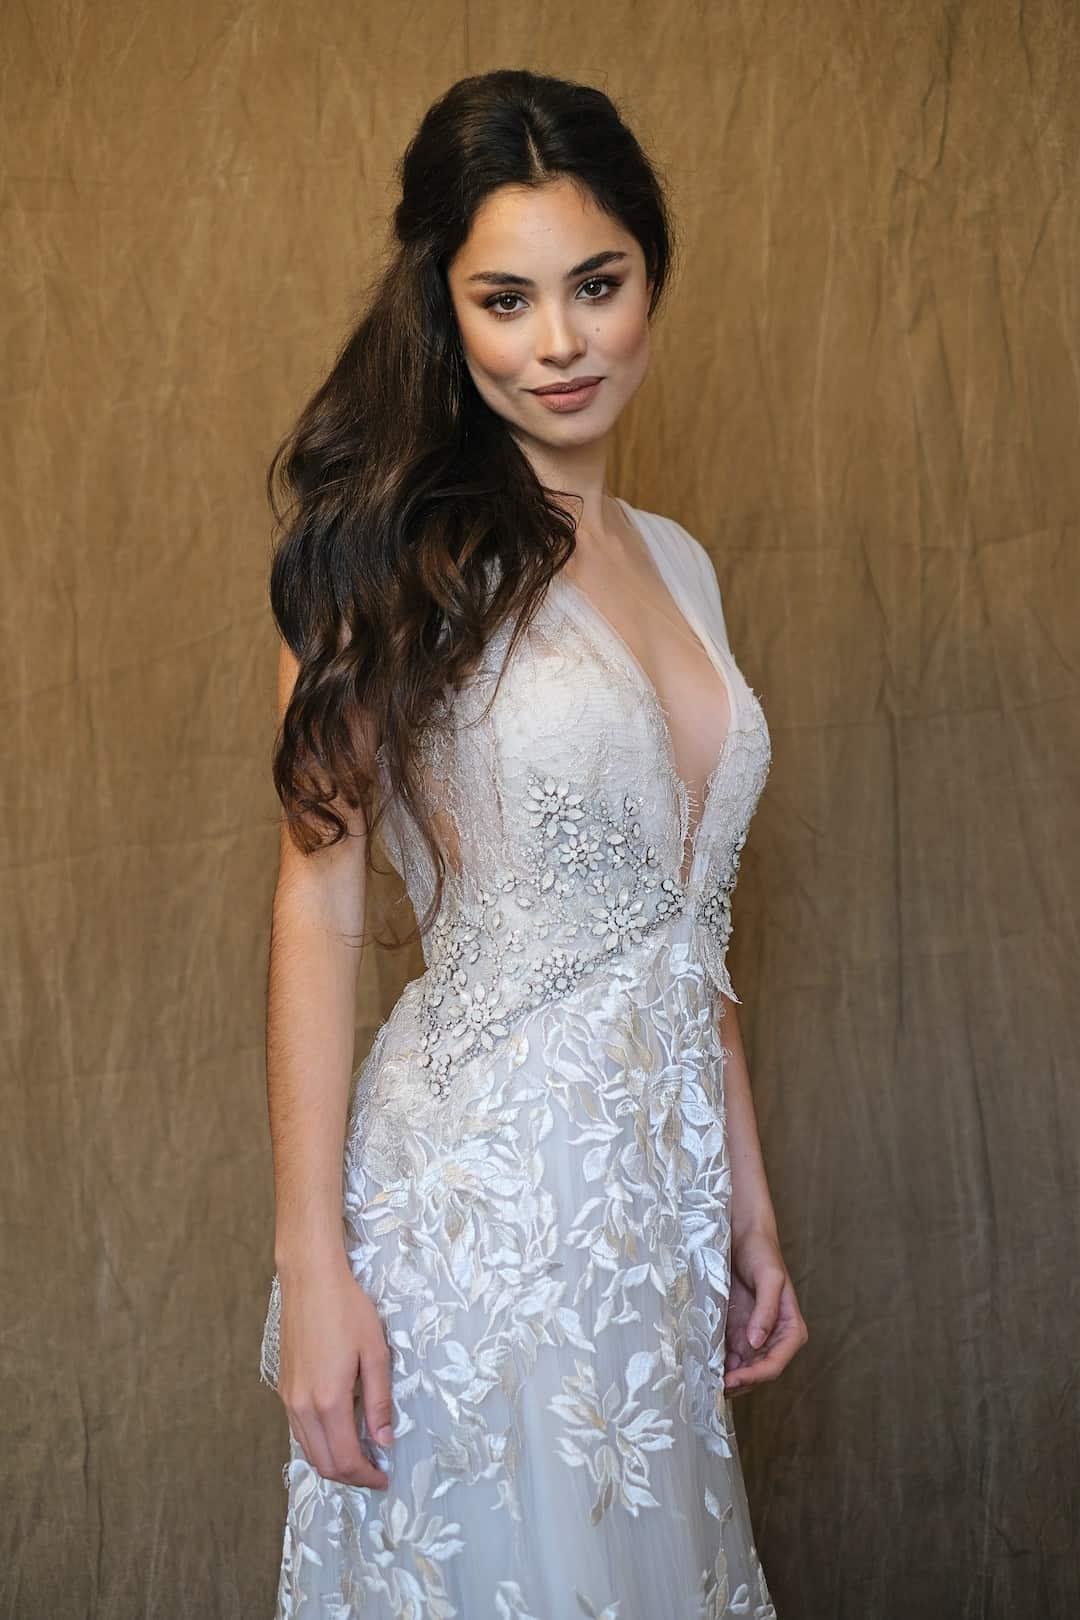 Romantic wedding dress - Marco&Maria - 2017-1017- front_top